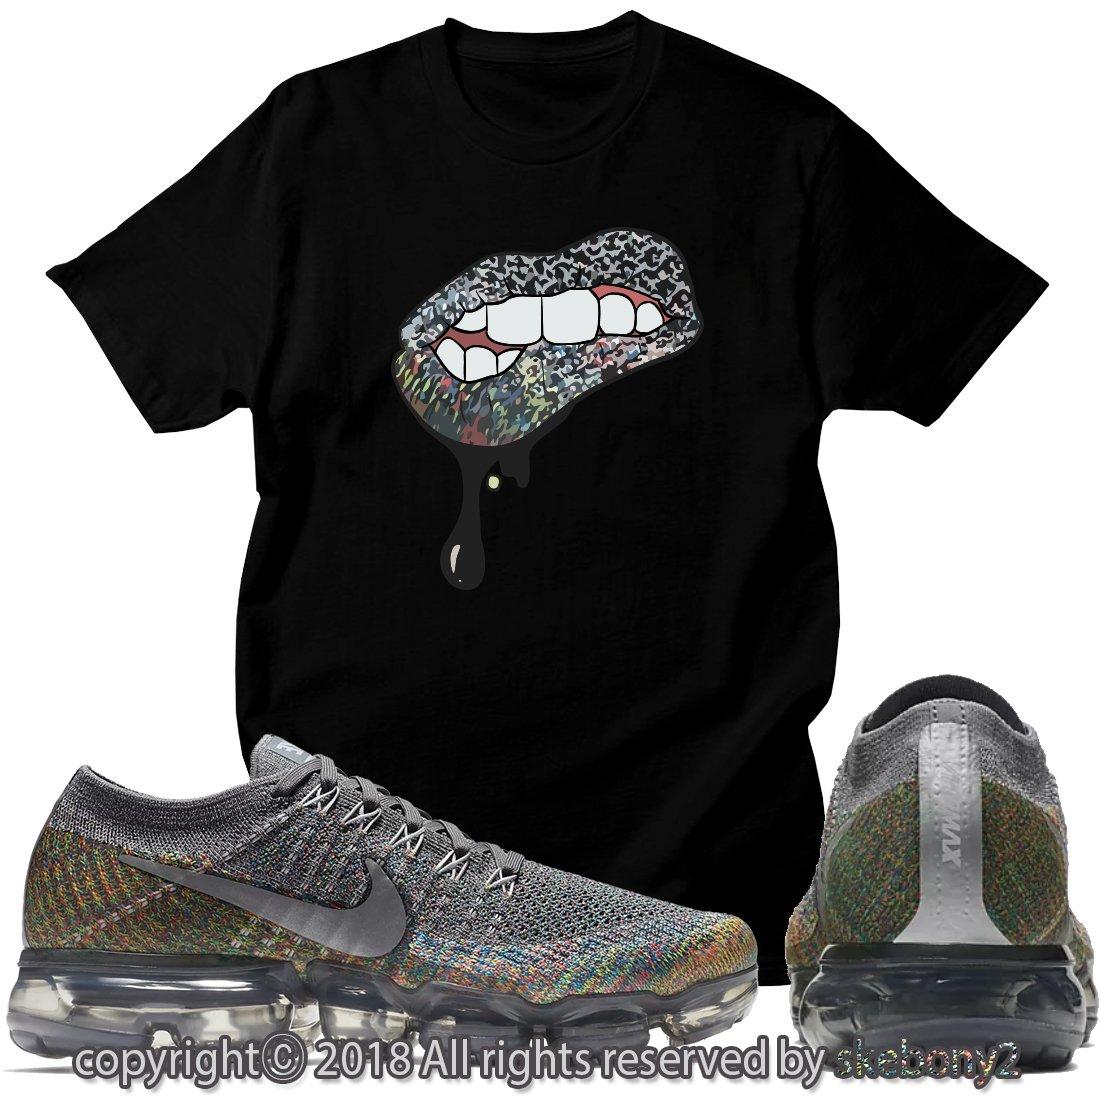 61d71b04883a12 Custom T Shirt Matching Nike AIR Vapormax Plus Flyknit Running Gray  AVP-1-44-2 at Amazon Men s Clothing store